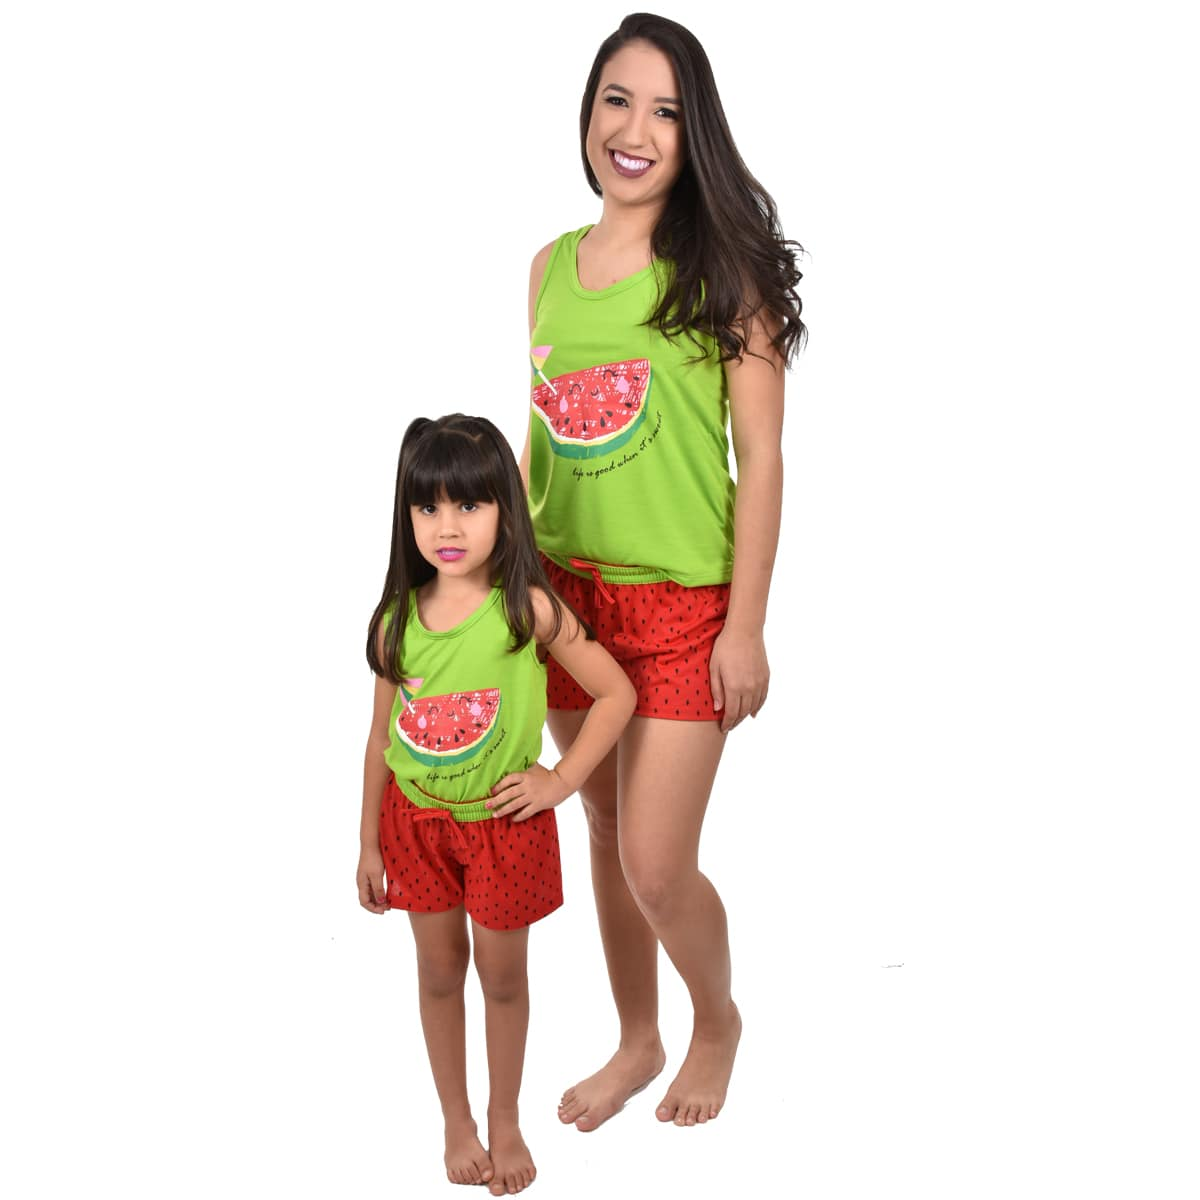 Baby Doll Short Doll Camiseta Regata Melancia Adulto Ref: 320